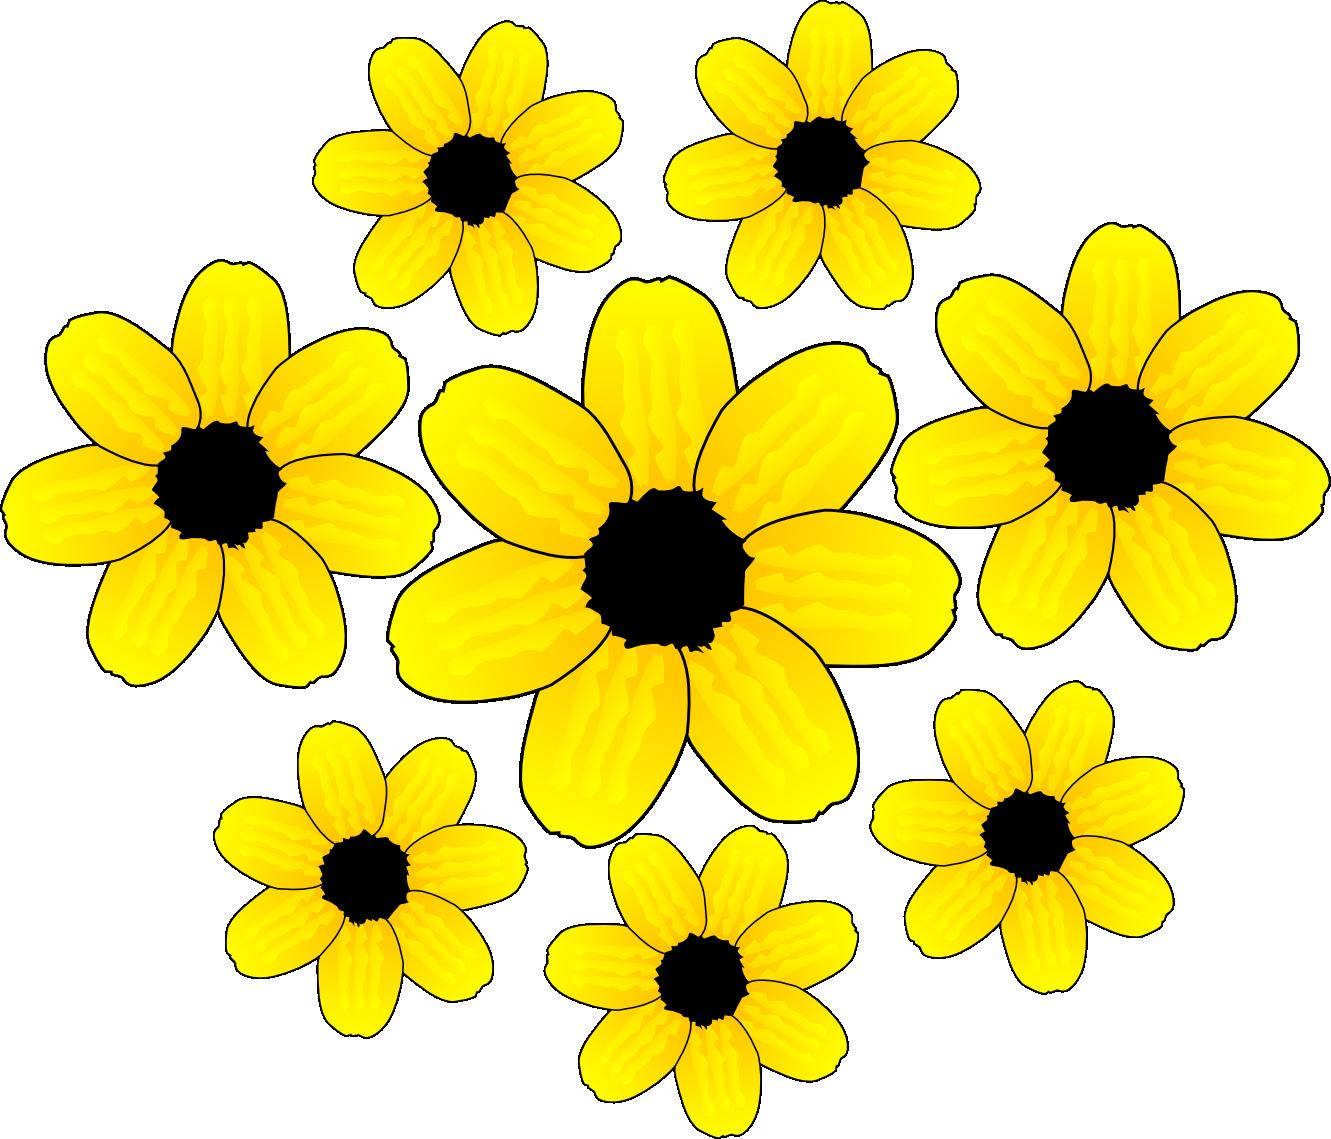 Yellow Flower Clip Art - ClipArt Best   clip art...gmk   Pinterest   The 3, Graphics and Changu0026#39;e 3